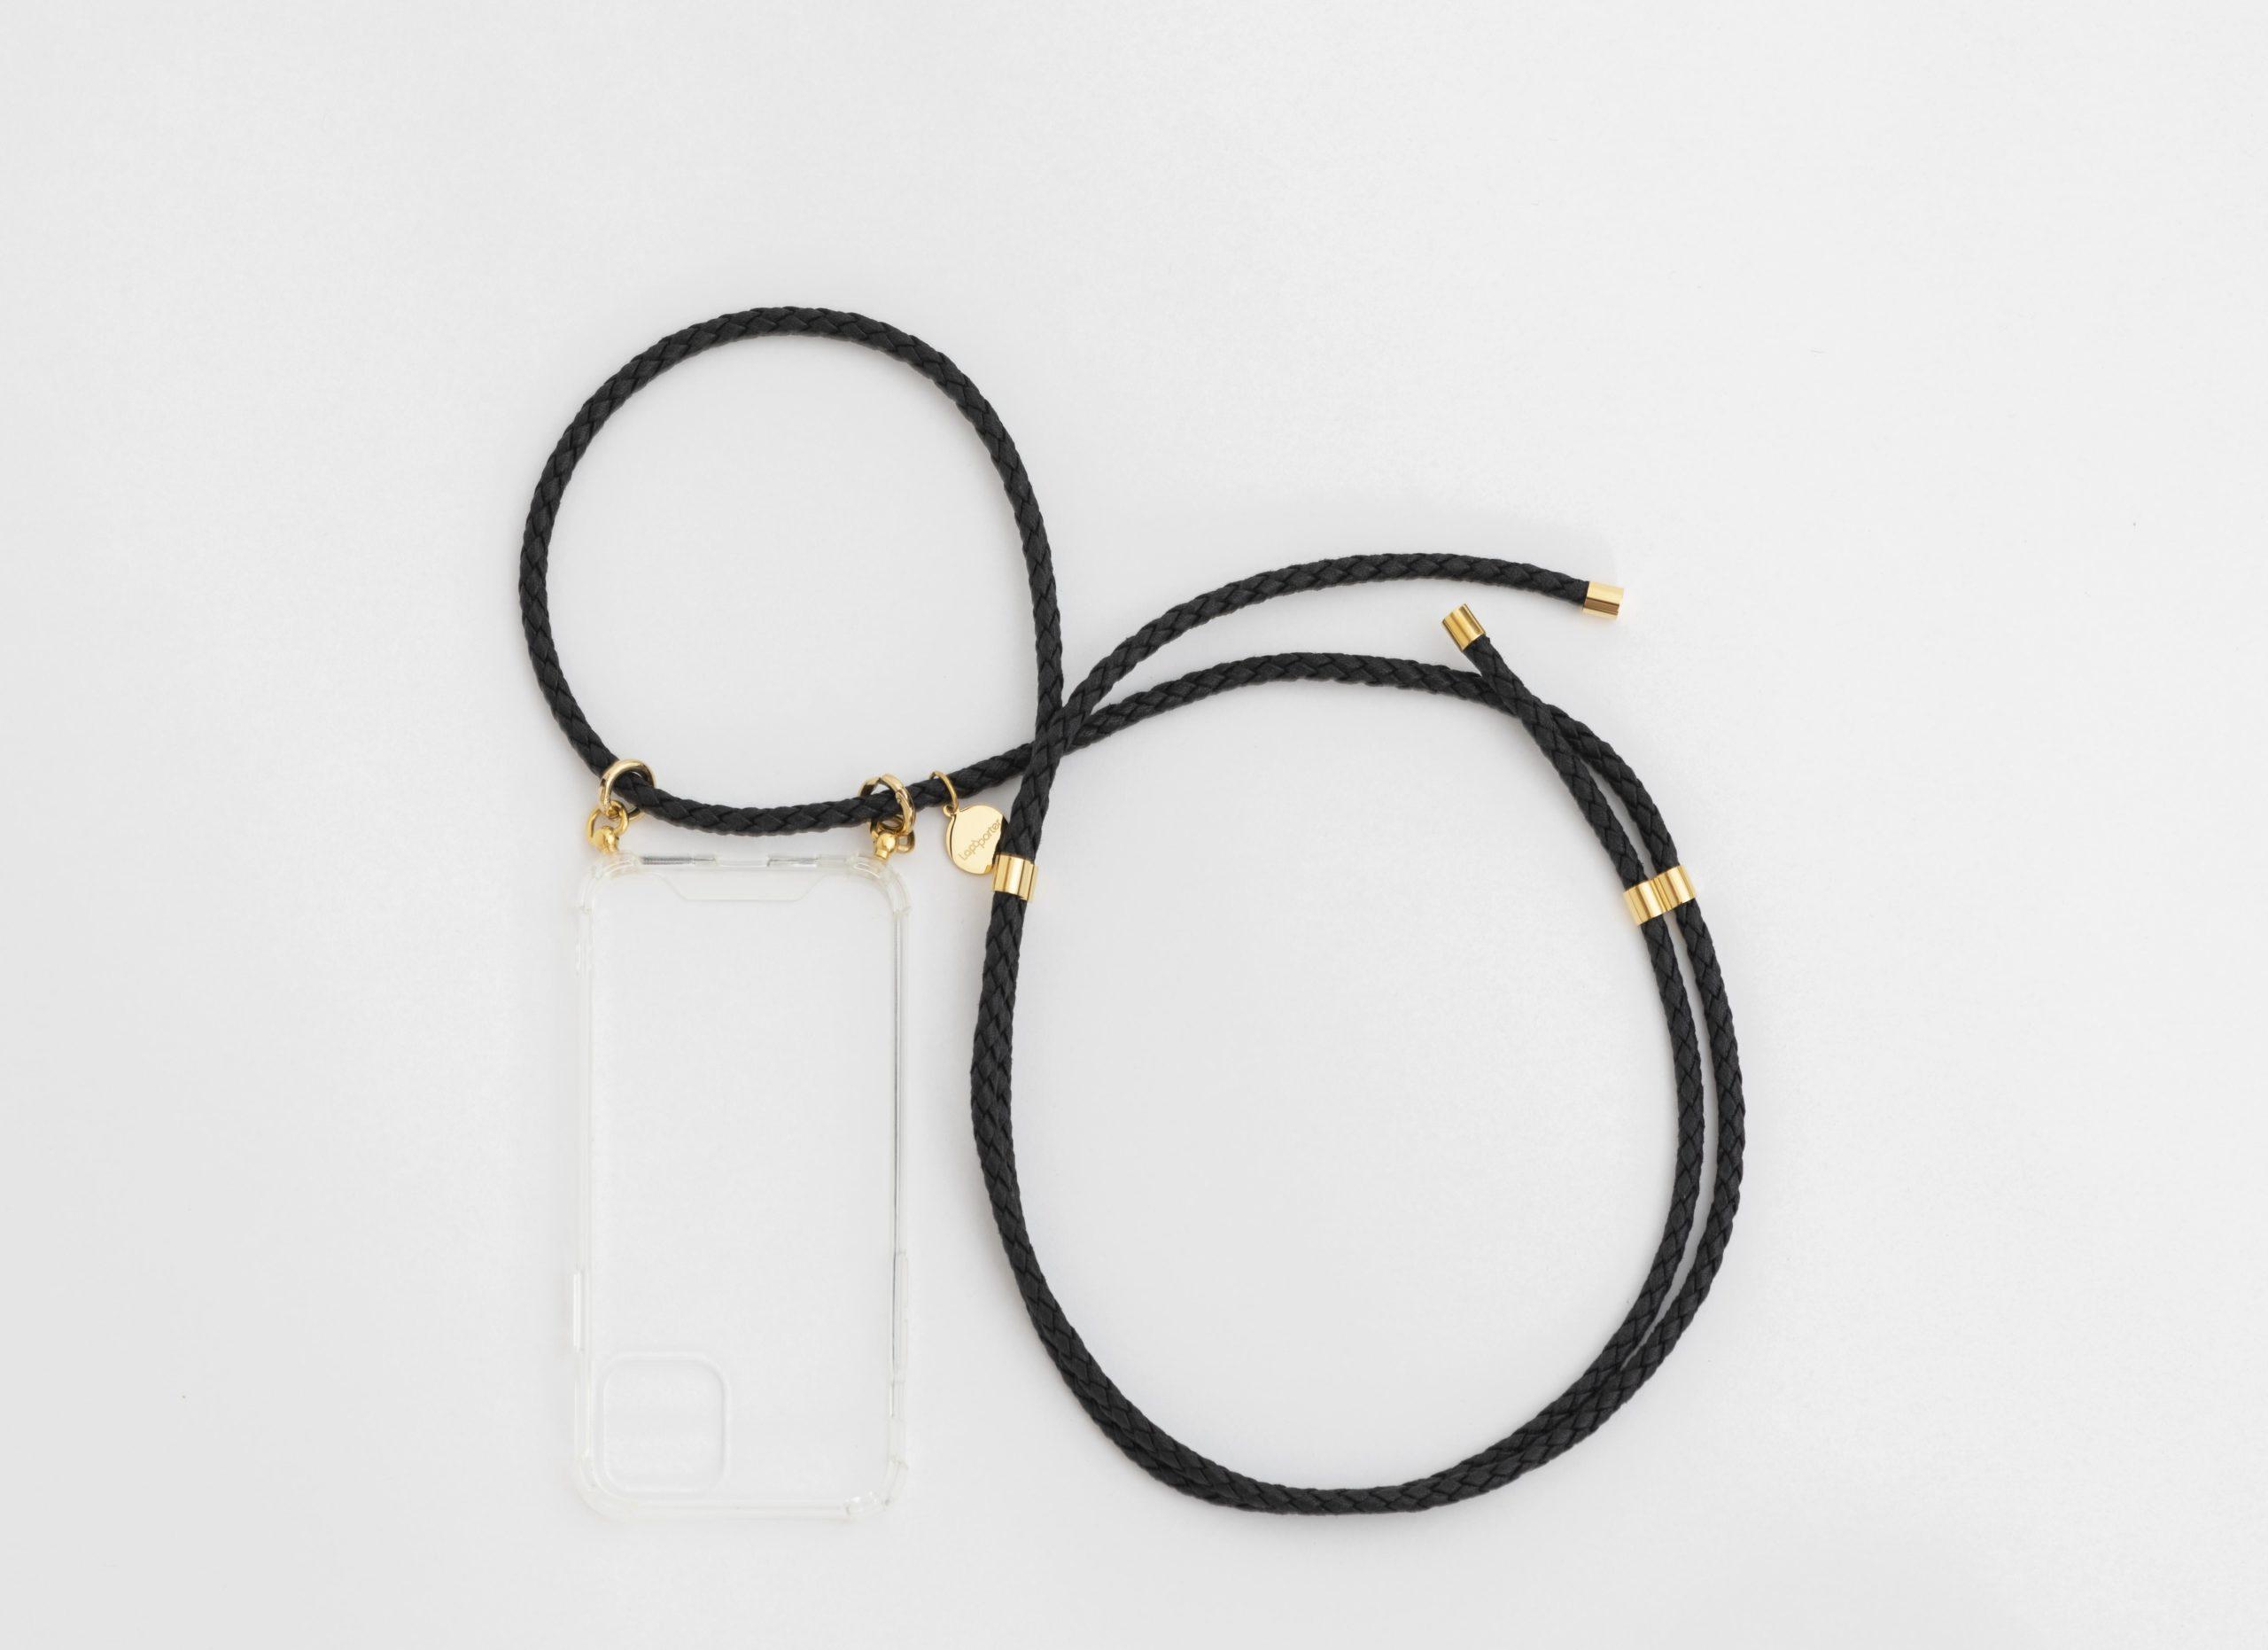 2020-10-04_Lapaporter-Brillenketten_Grau-5